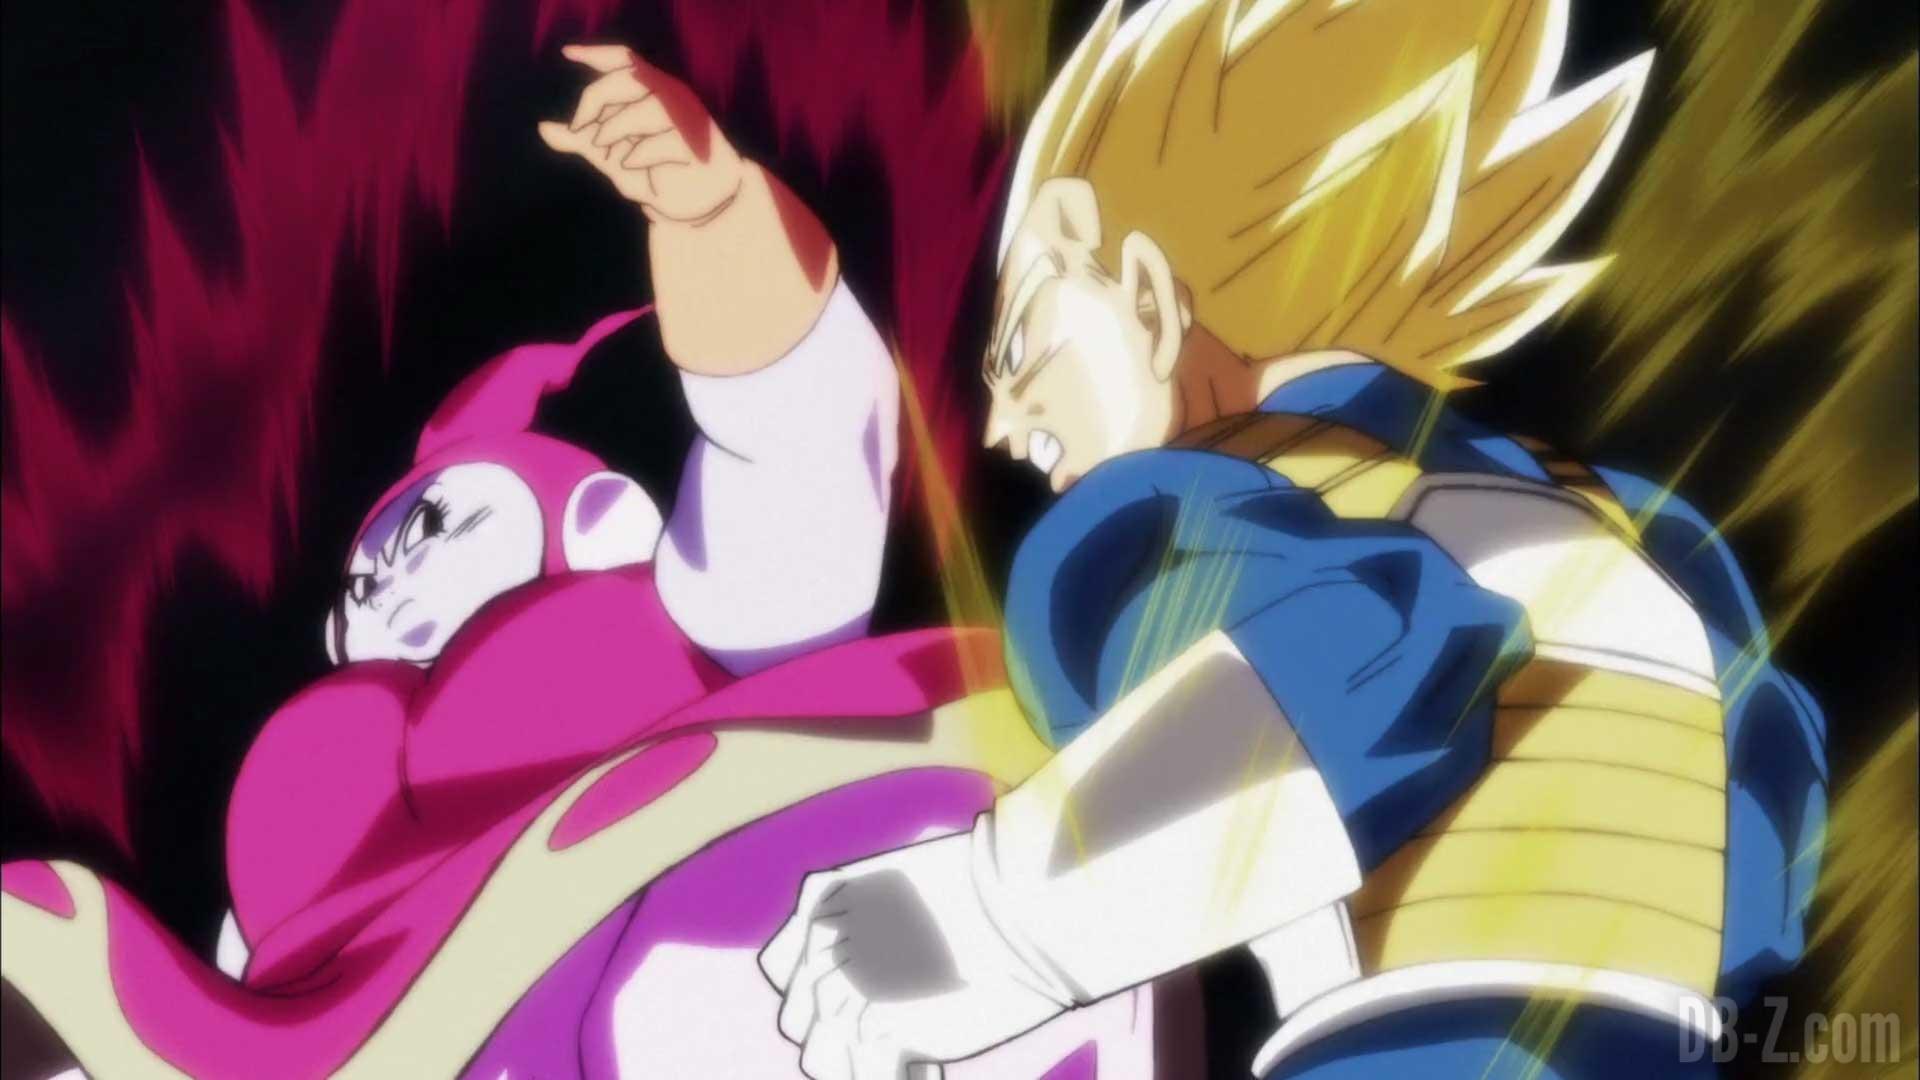 Dragon Ball Super Episode 102 Spoilers :Android 17 on Limelight! Vegeta vs Brianne